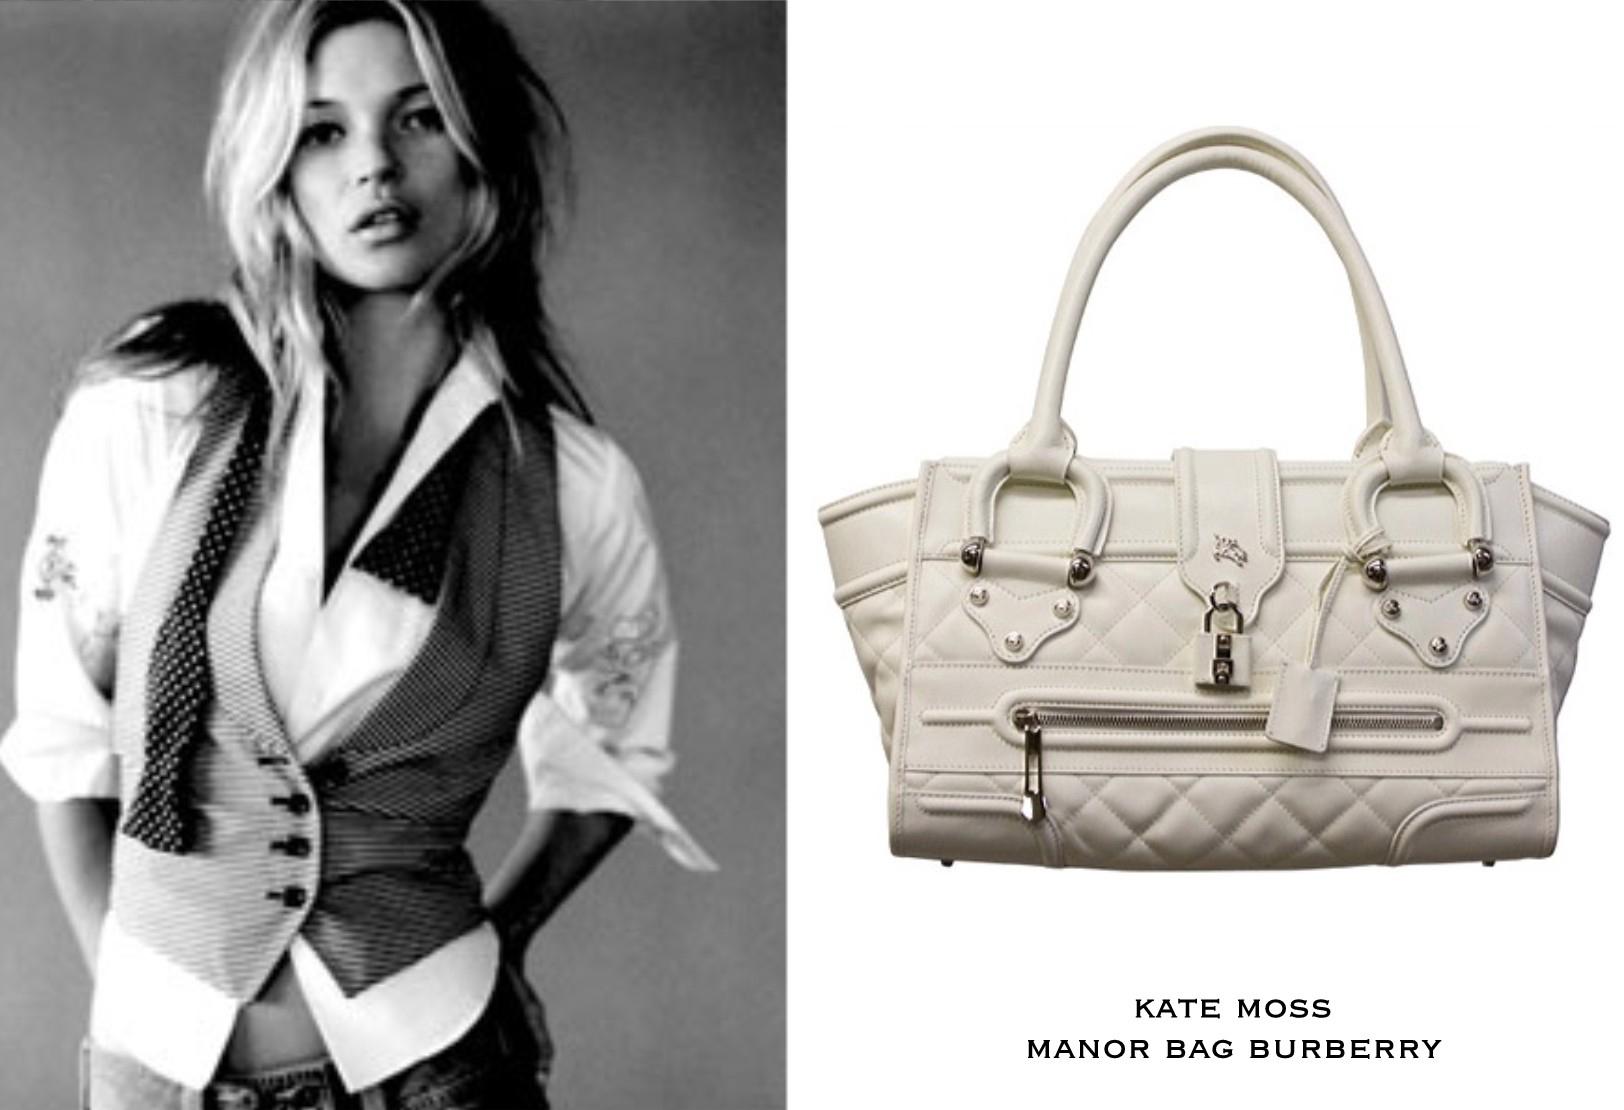 manor-bag-burberry---kate-moss